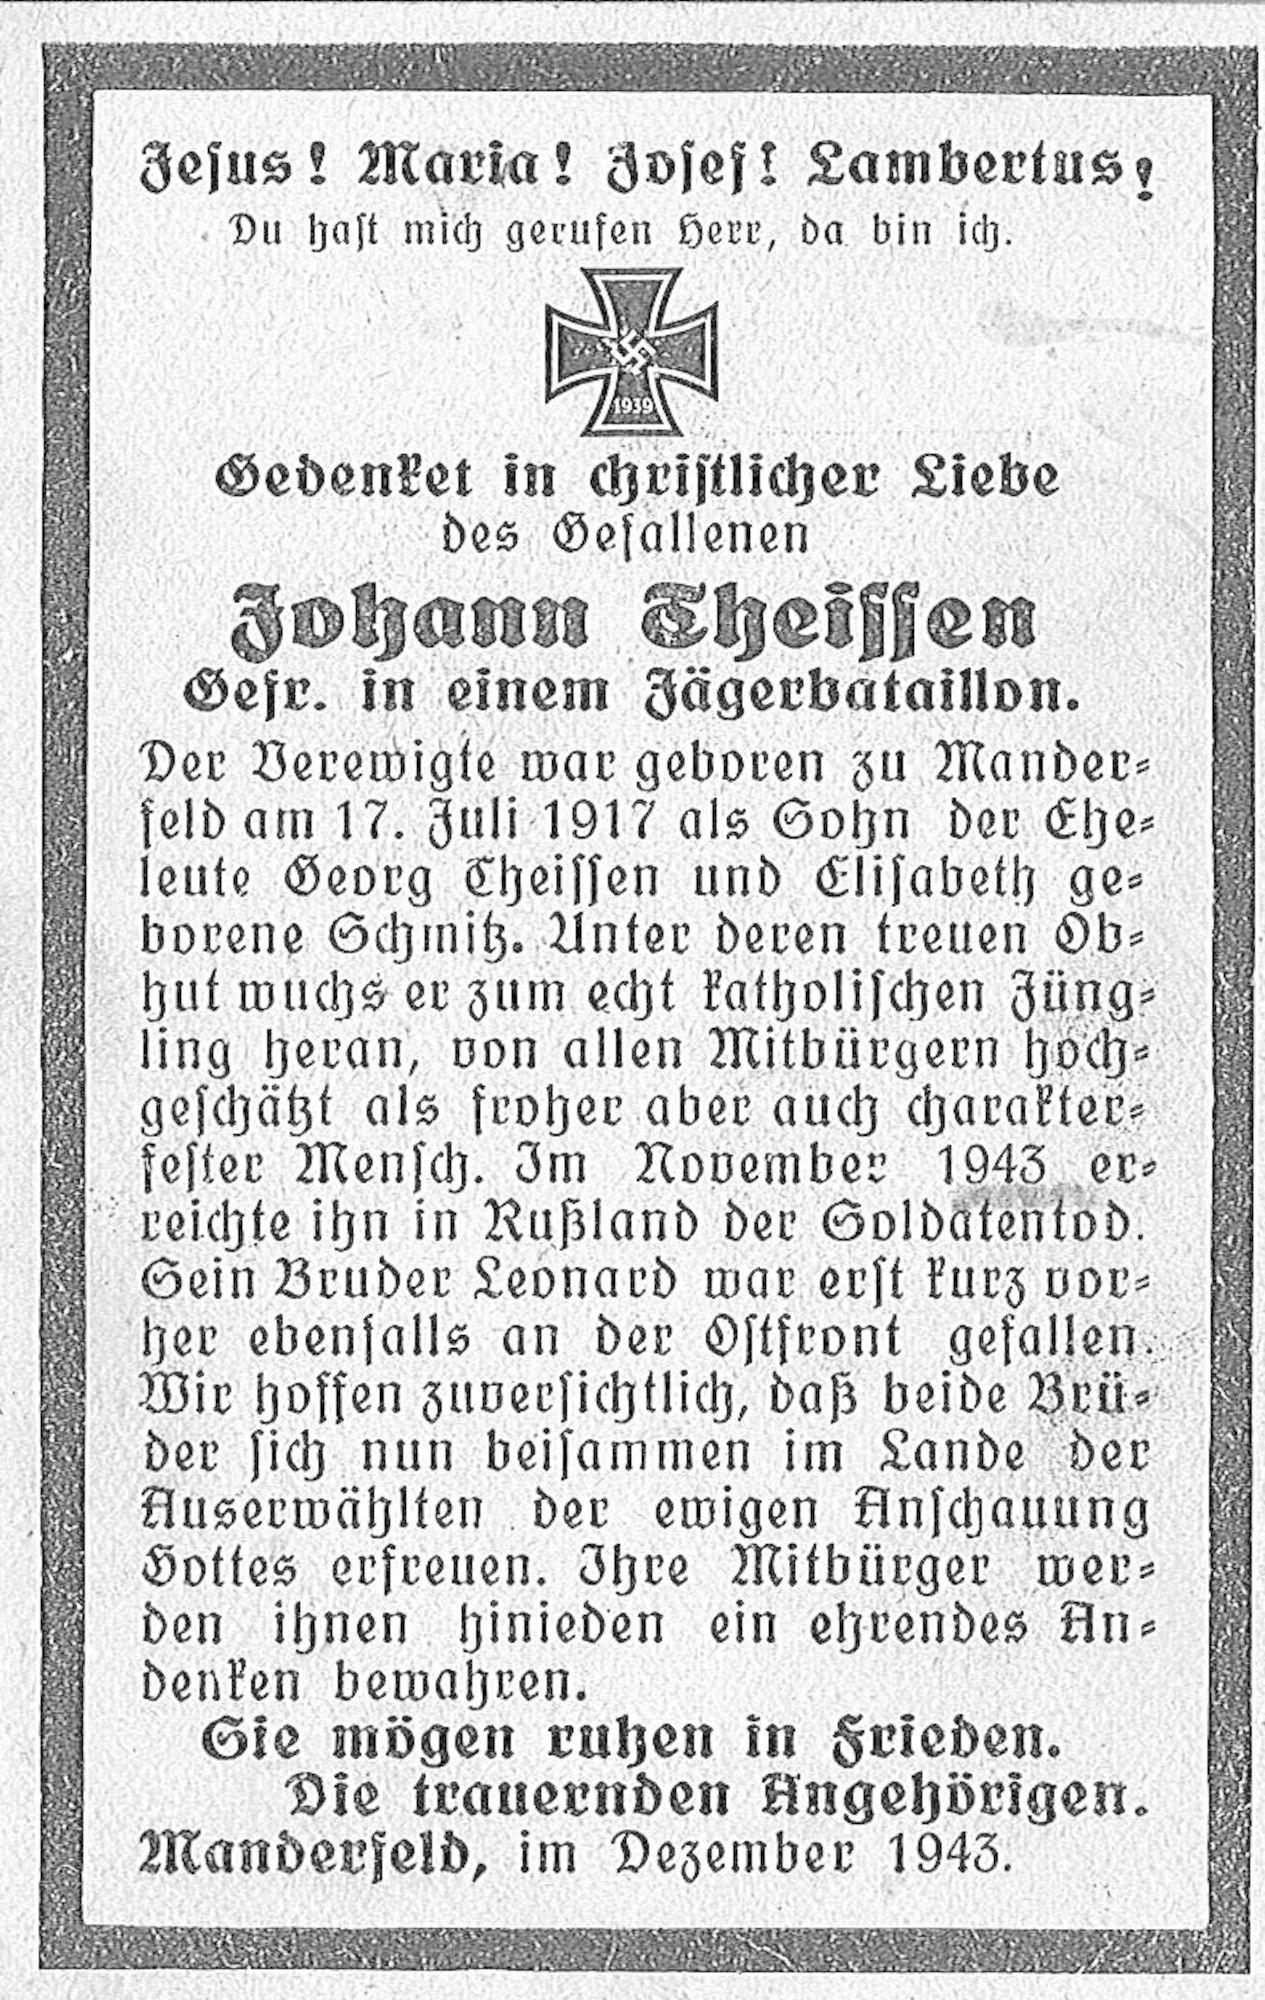 Johann Theissen